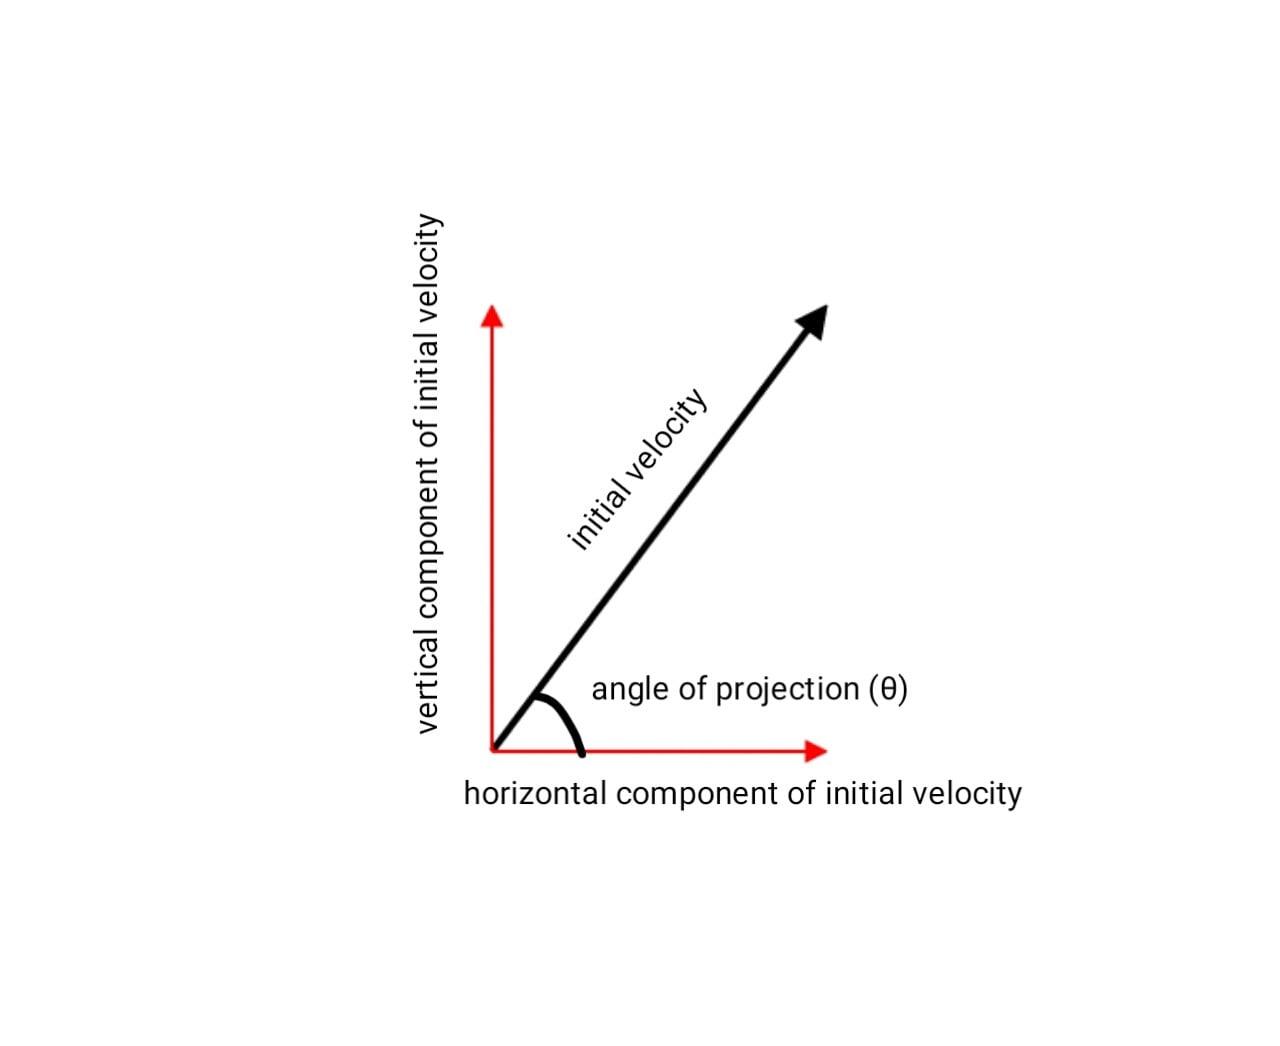 Resolving initial velocity